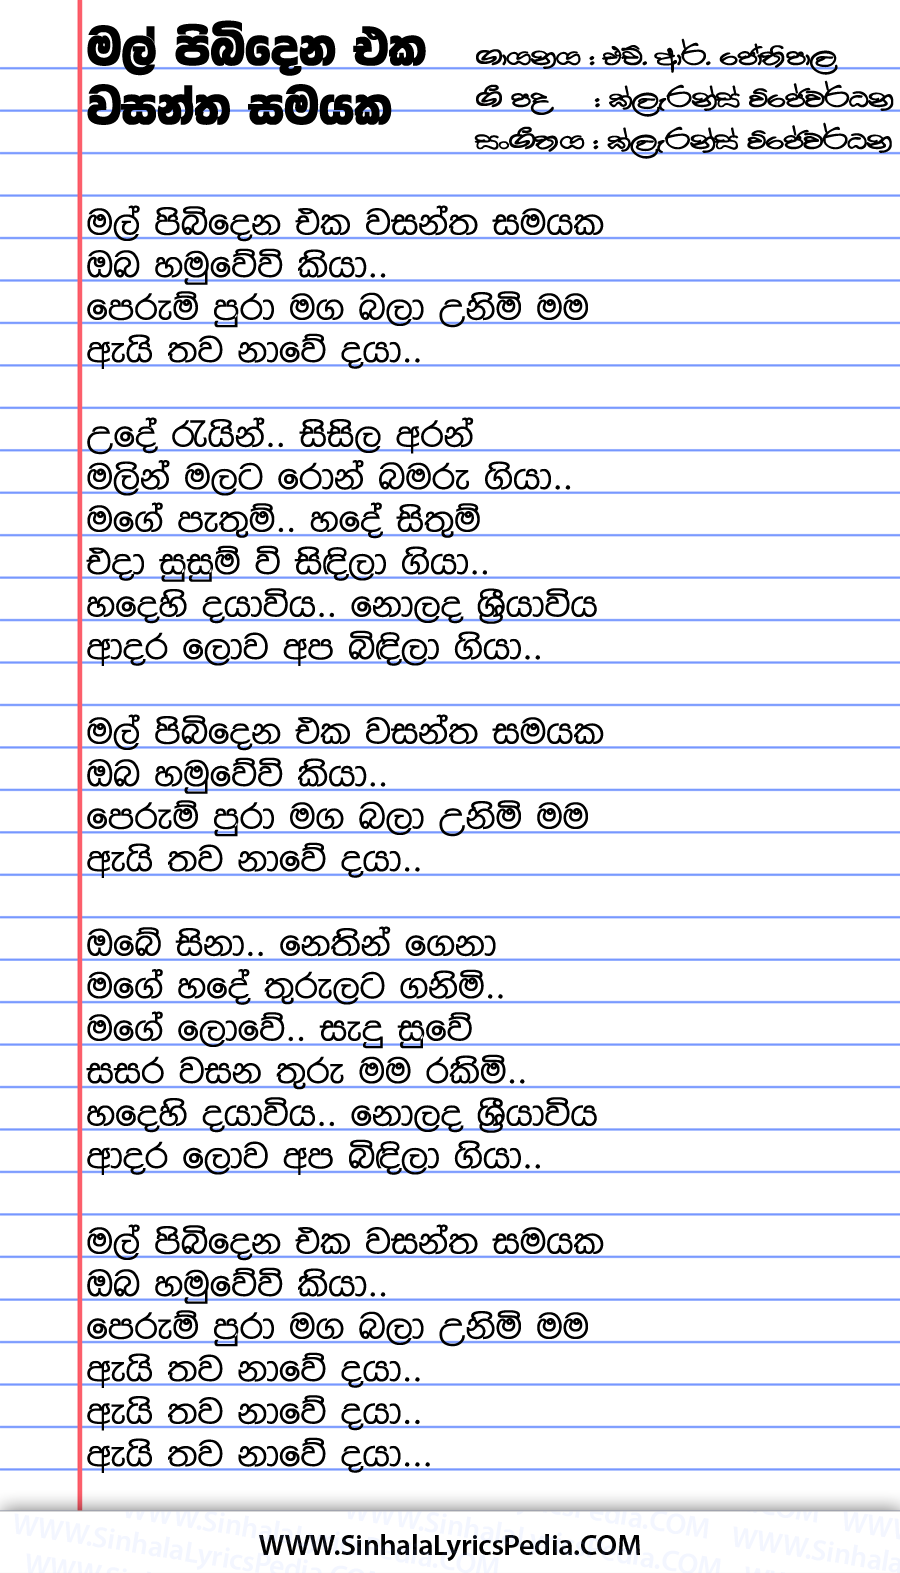 Mal Pibidena Eka Wasantha Samayaka Song Lyrics